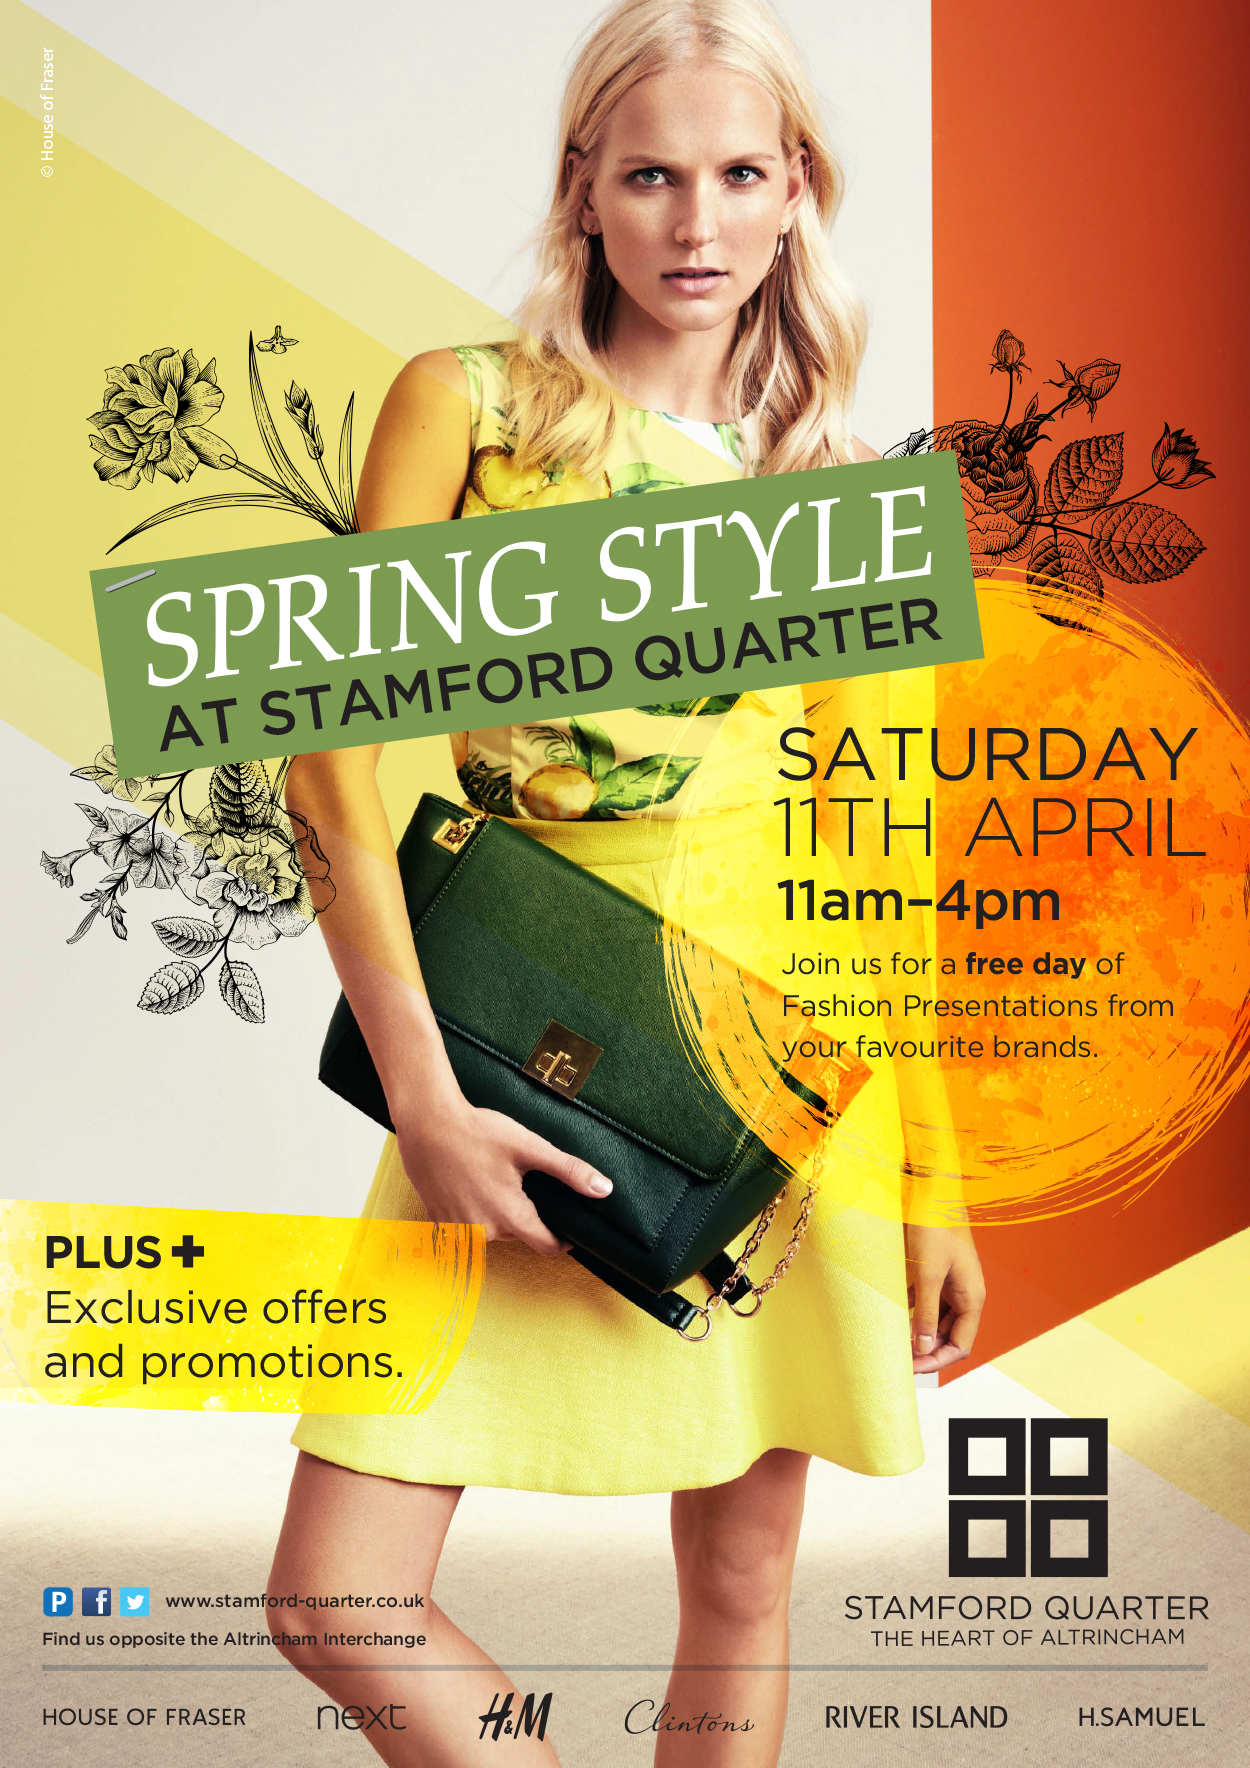 Spring Style at Stamford Quarter